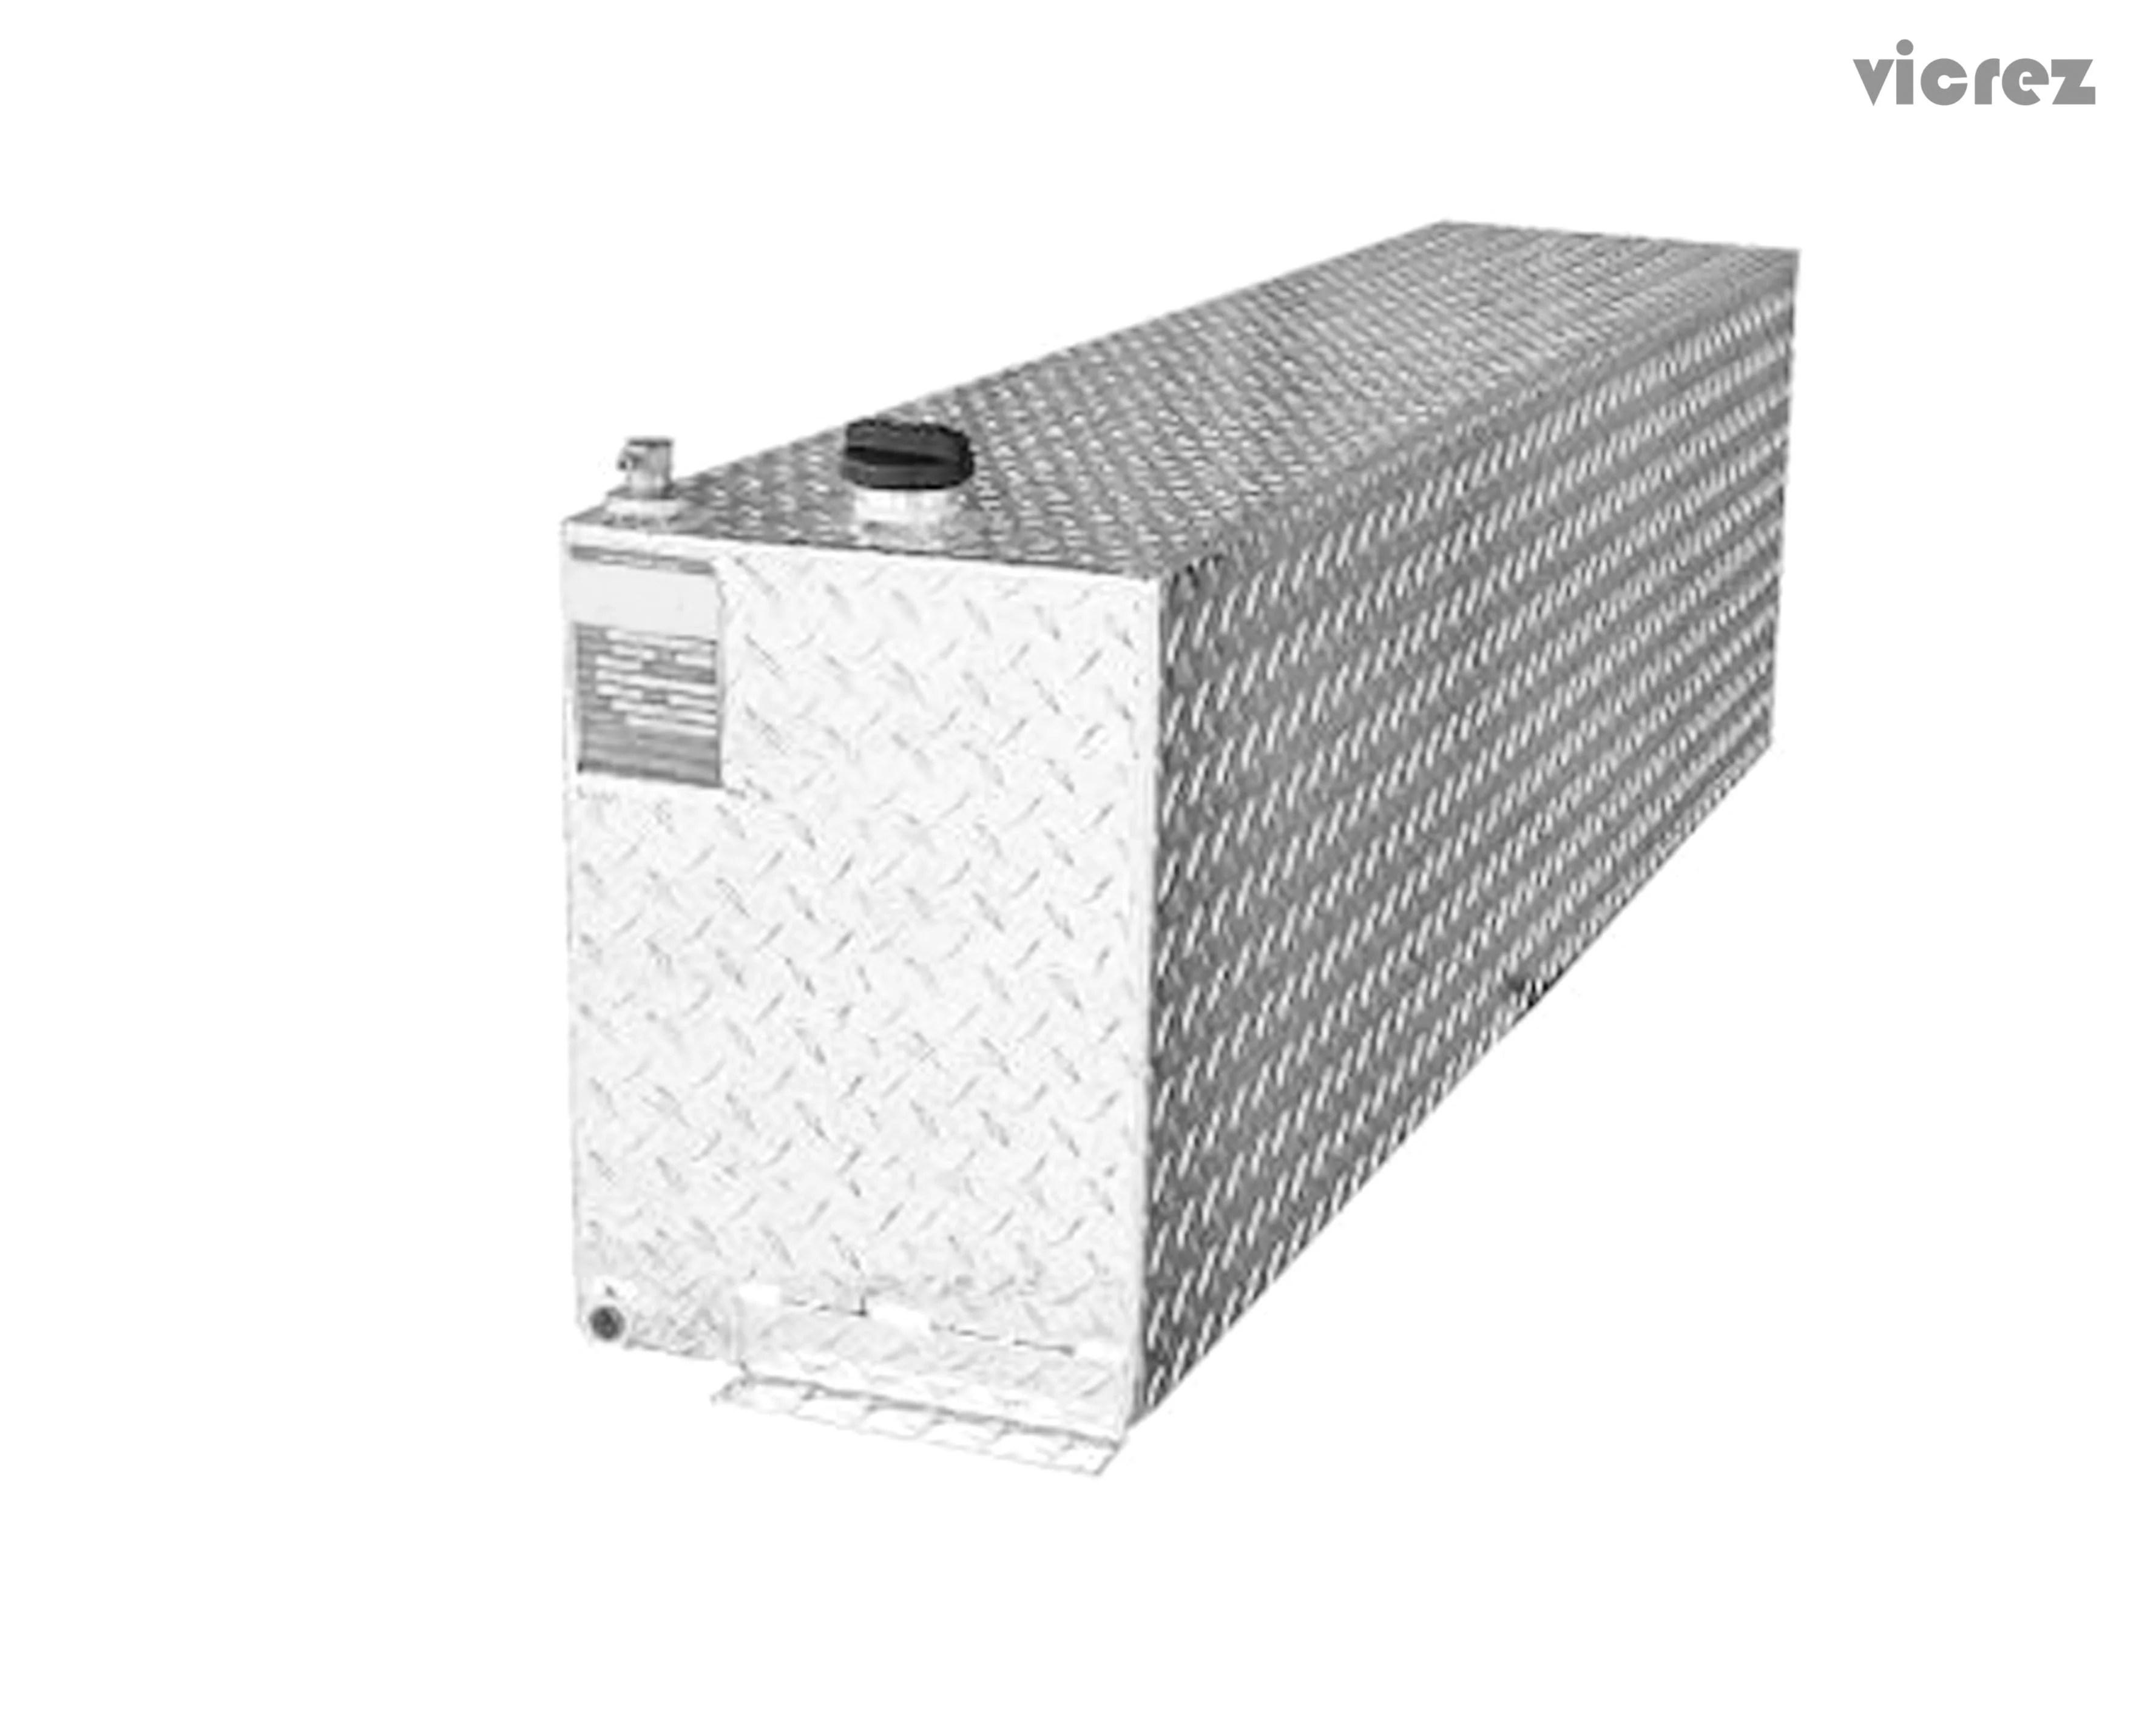 Vicrez Aluminum Tank 46 Gallonssel Auxiliary Rectangle